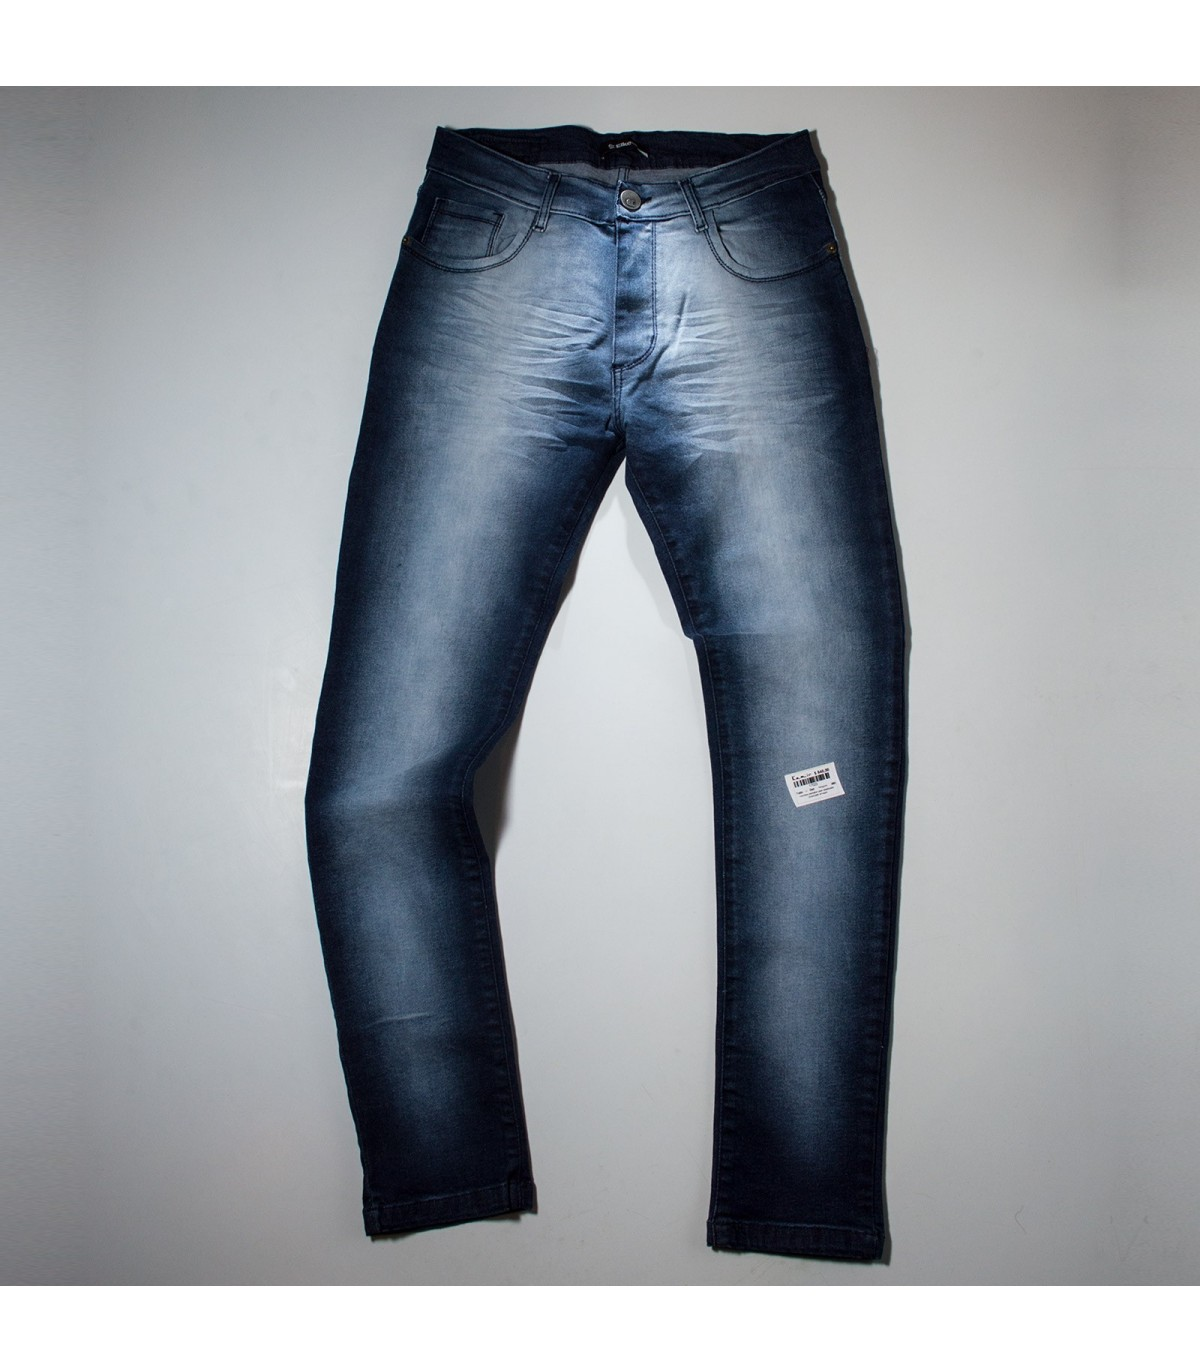 Hombre Pantalon Jean Elastizado Localizado Arrugas